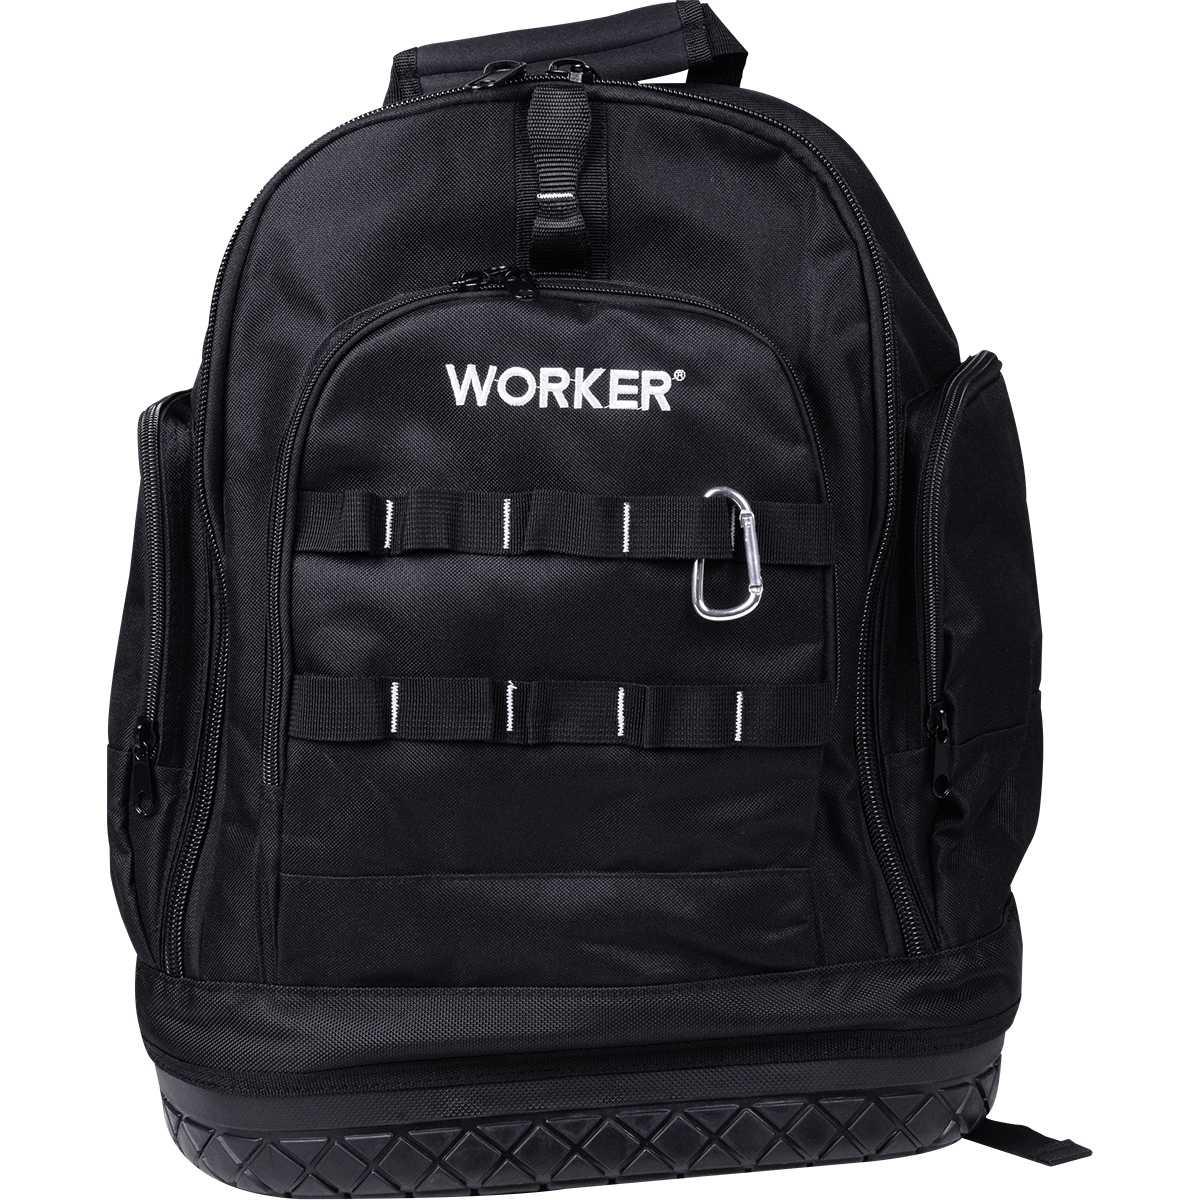 "Mochila para Ferramentas com Base Emborrachada 14"" Worker"